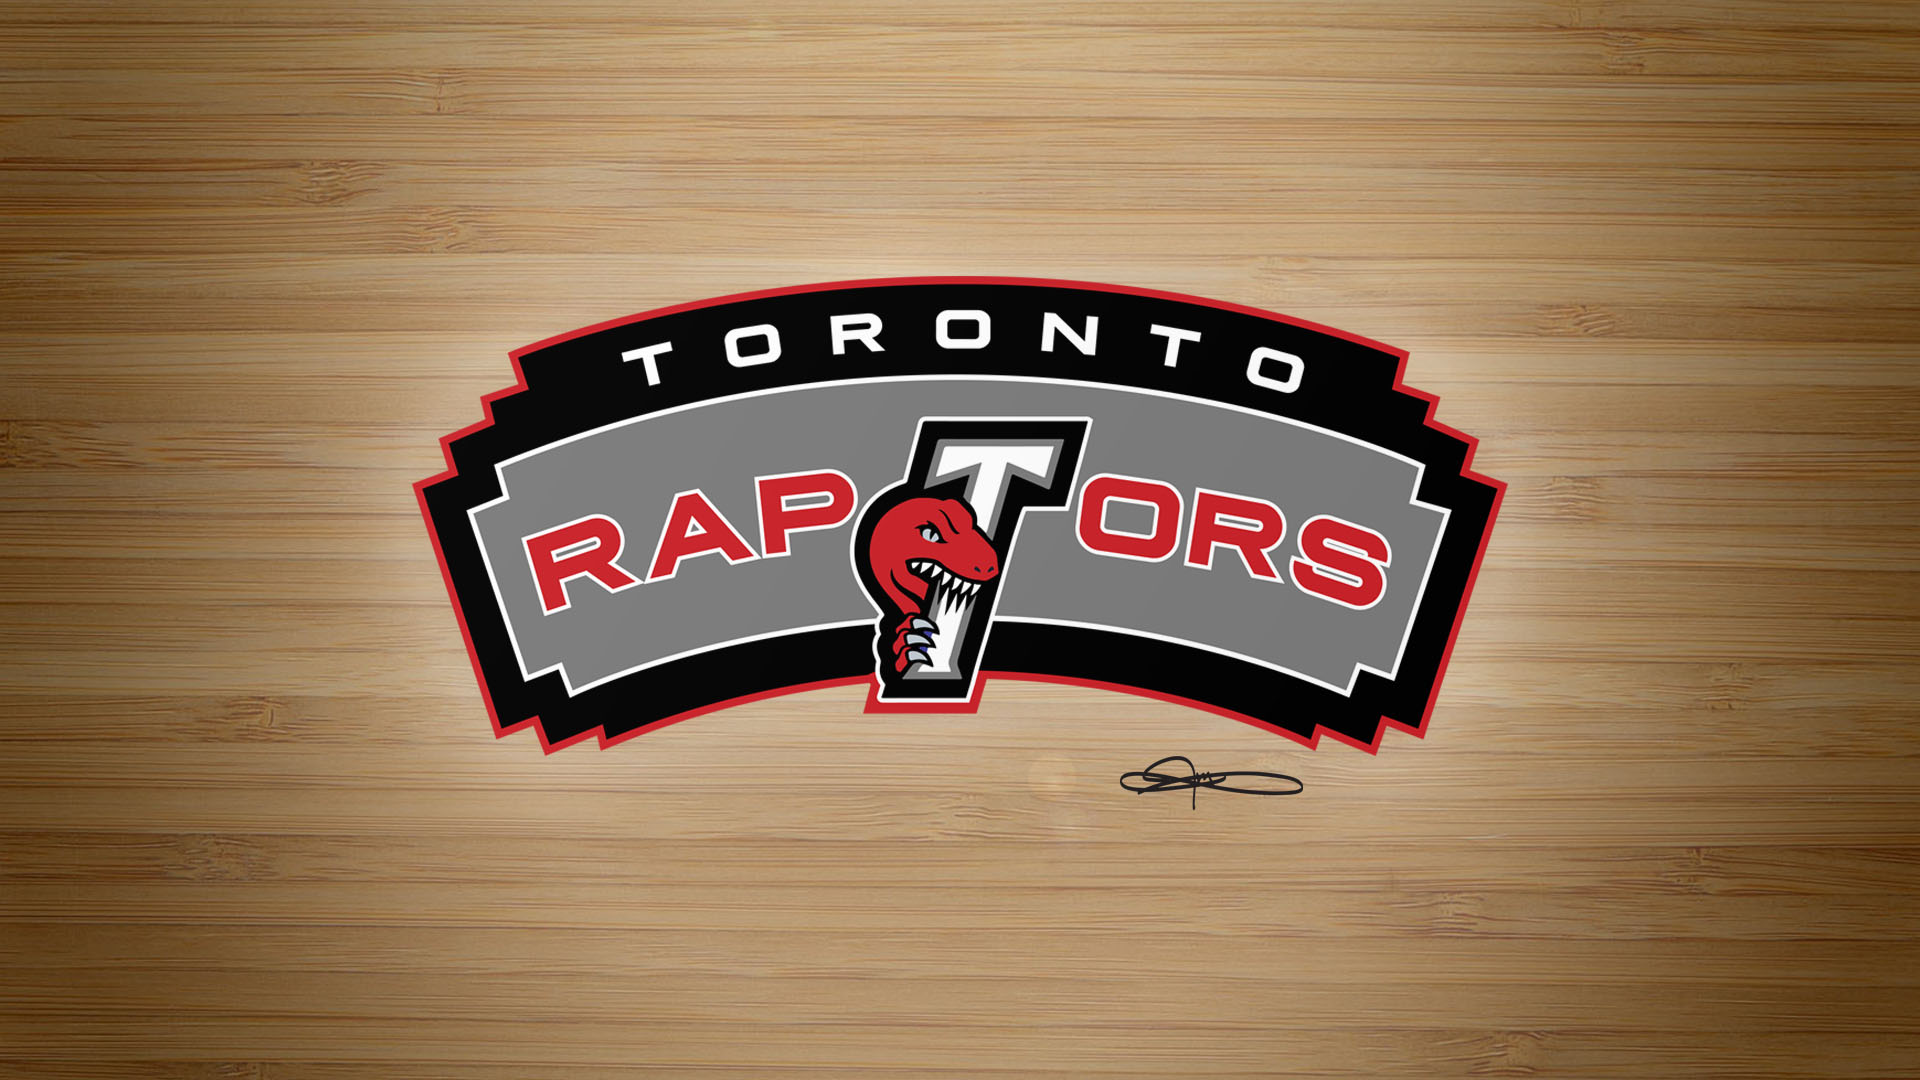 Raptors X Spurs